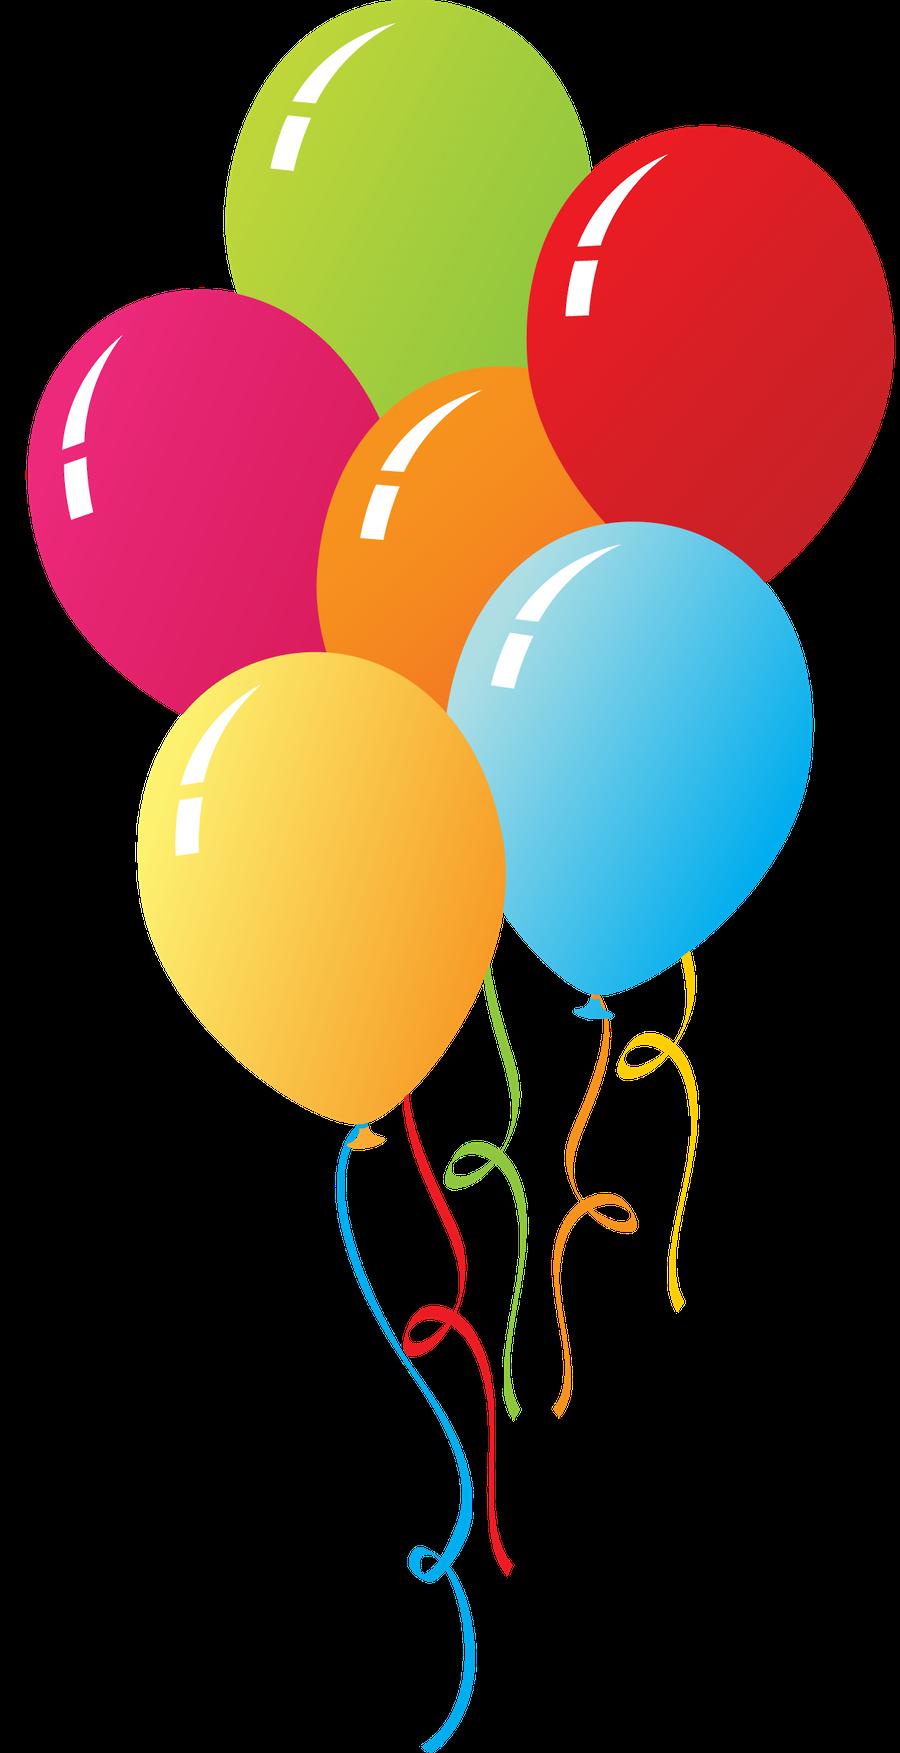 Birthday Gifts Parties Danimfalcaominus Mw6TxivPRKRzq Balloon Template Clipart